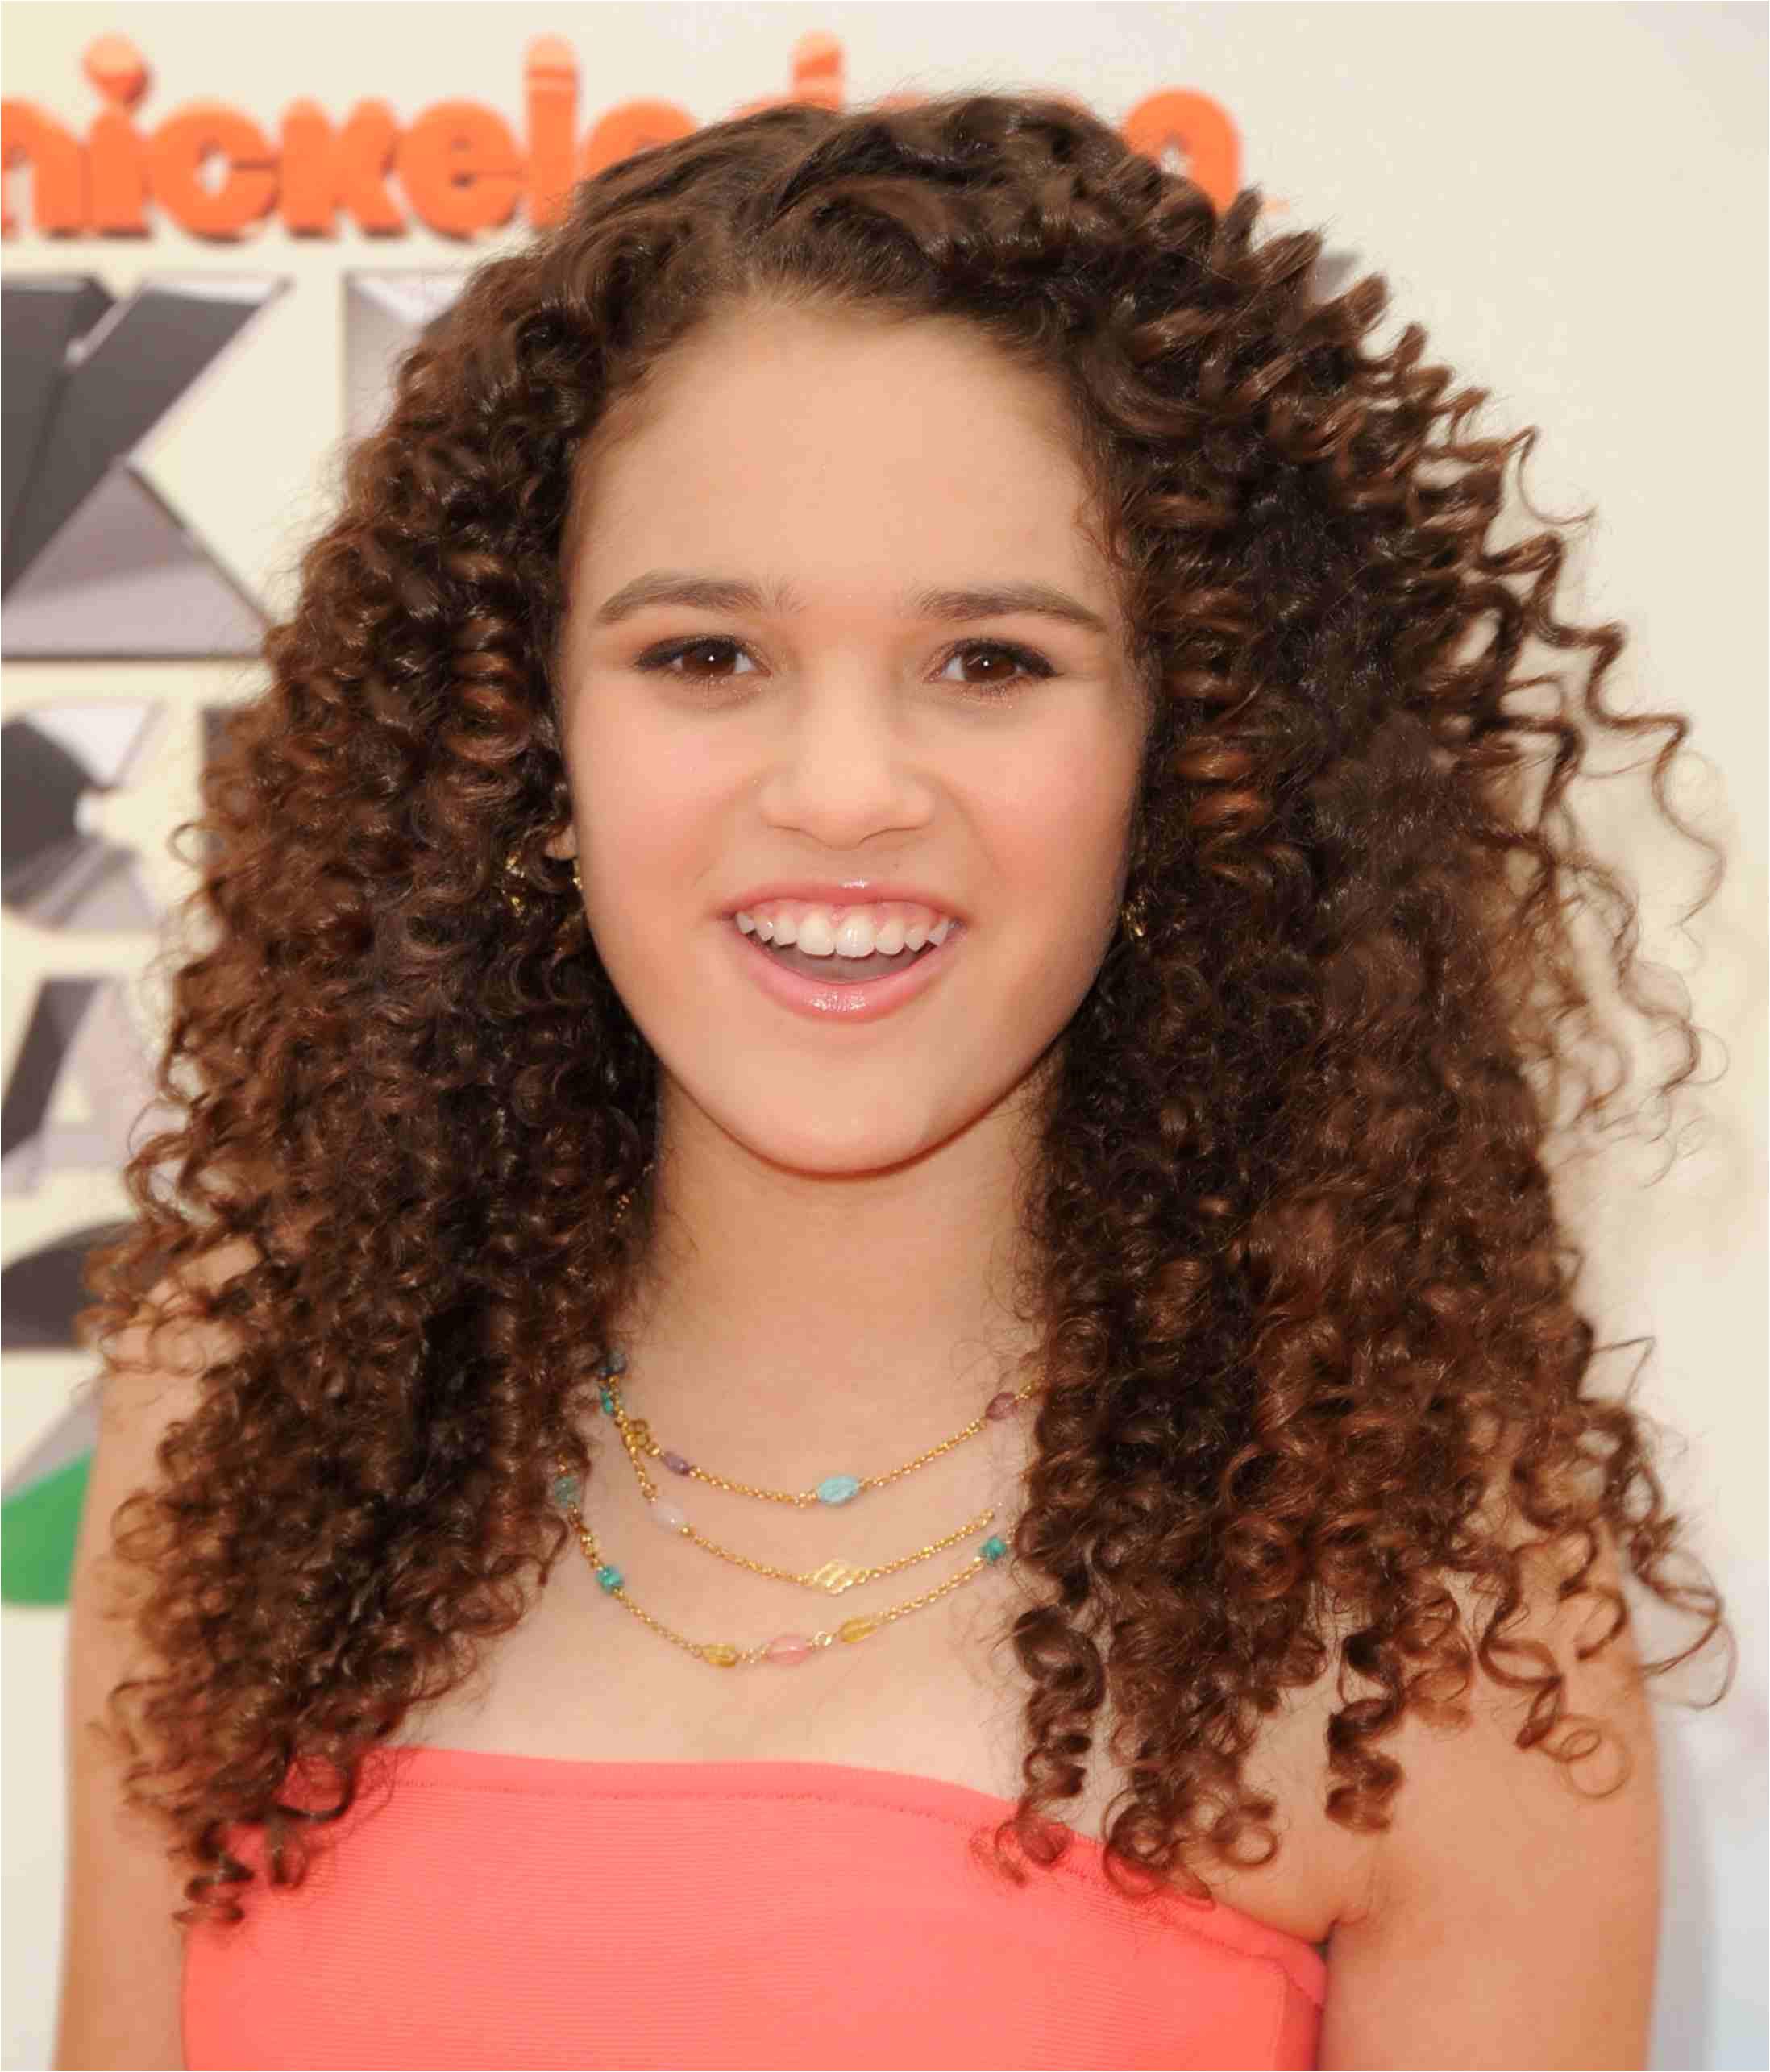 madison pettis curly hair 56a f9b58eba4b